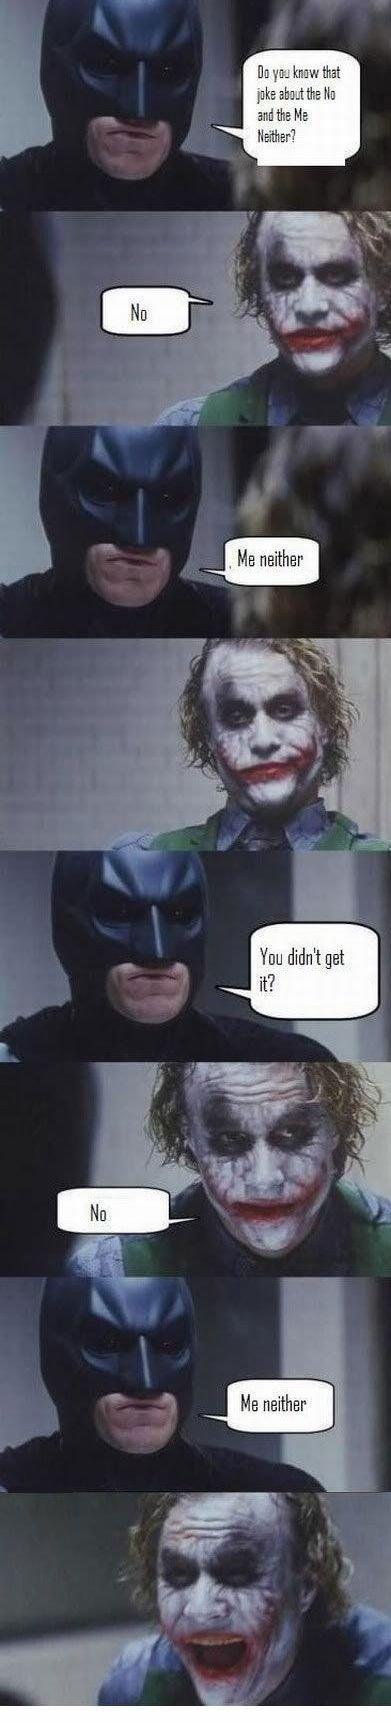 |. . and we Iain Driller? dim get. Batman told a joke? | and we Iain Driller? dim get Batman told a joke?